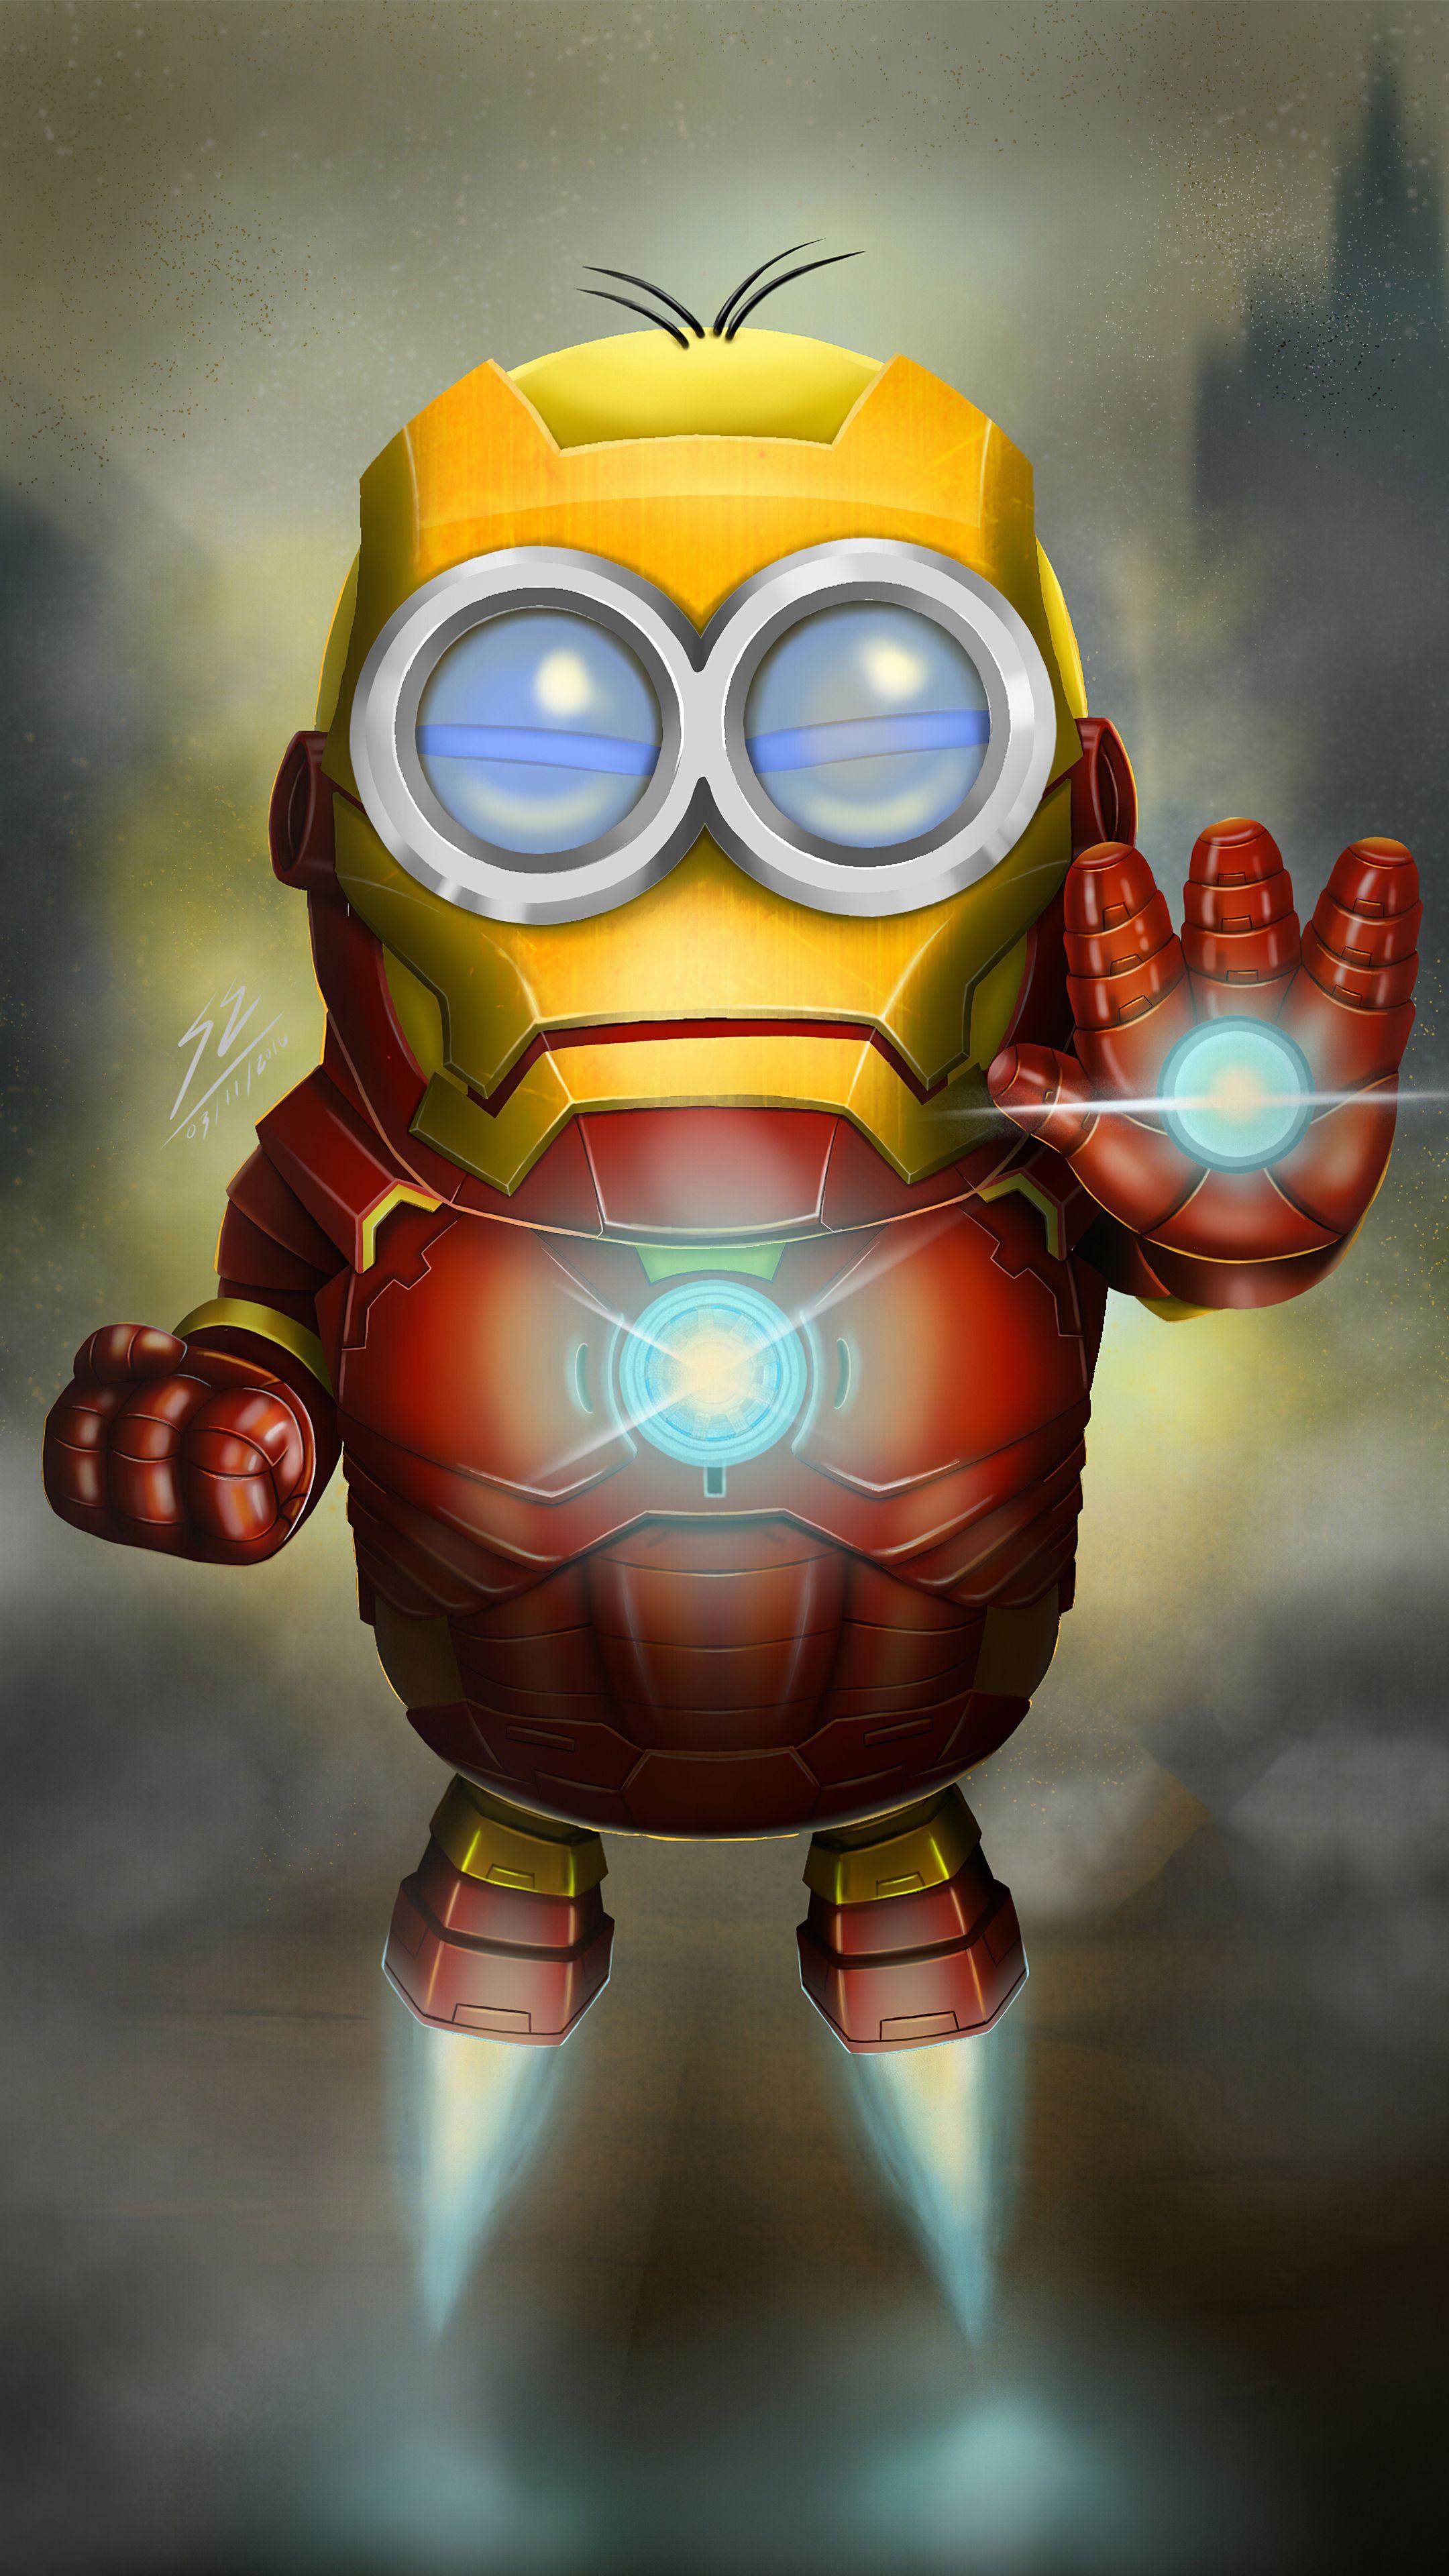 Minion As Iron Man Mobile HD Wallpaper in 2020 Hero